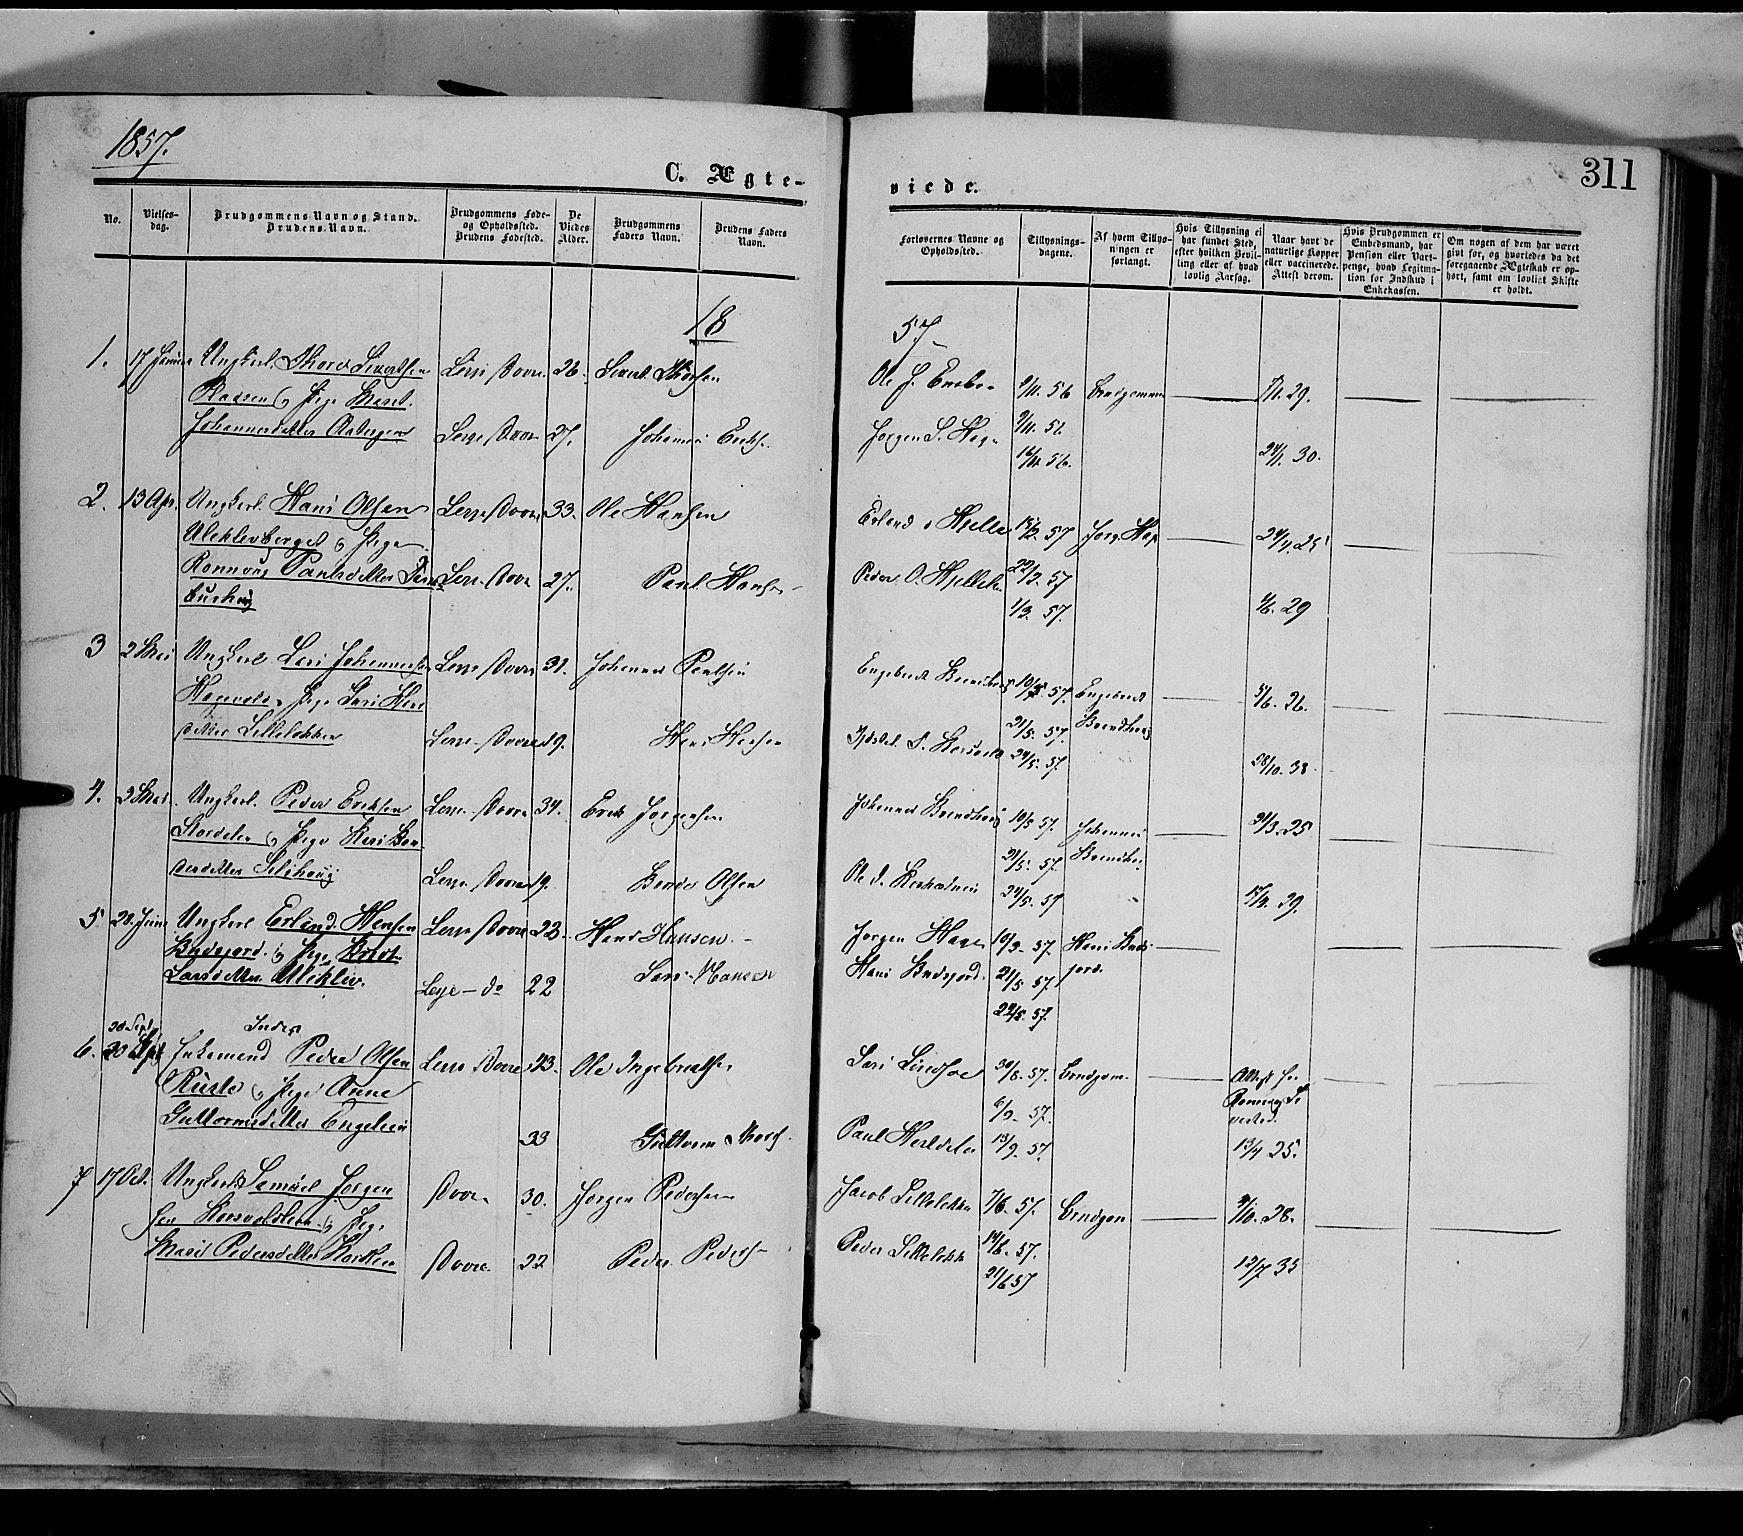 SAH, Dovre prestekontor, Ministerialbok nr. 1, 1854-1878, s. 311